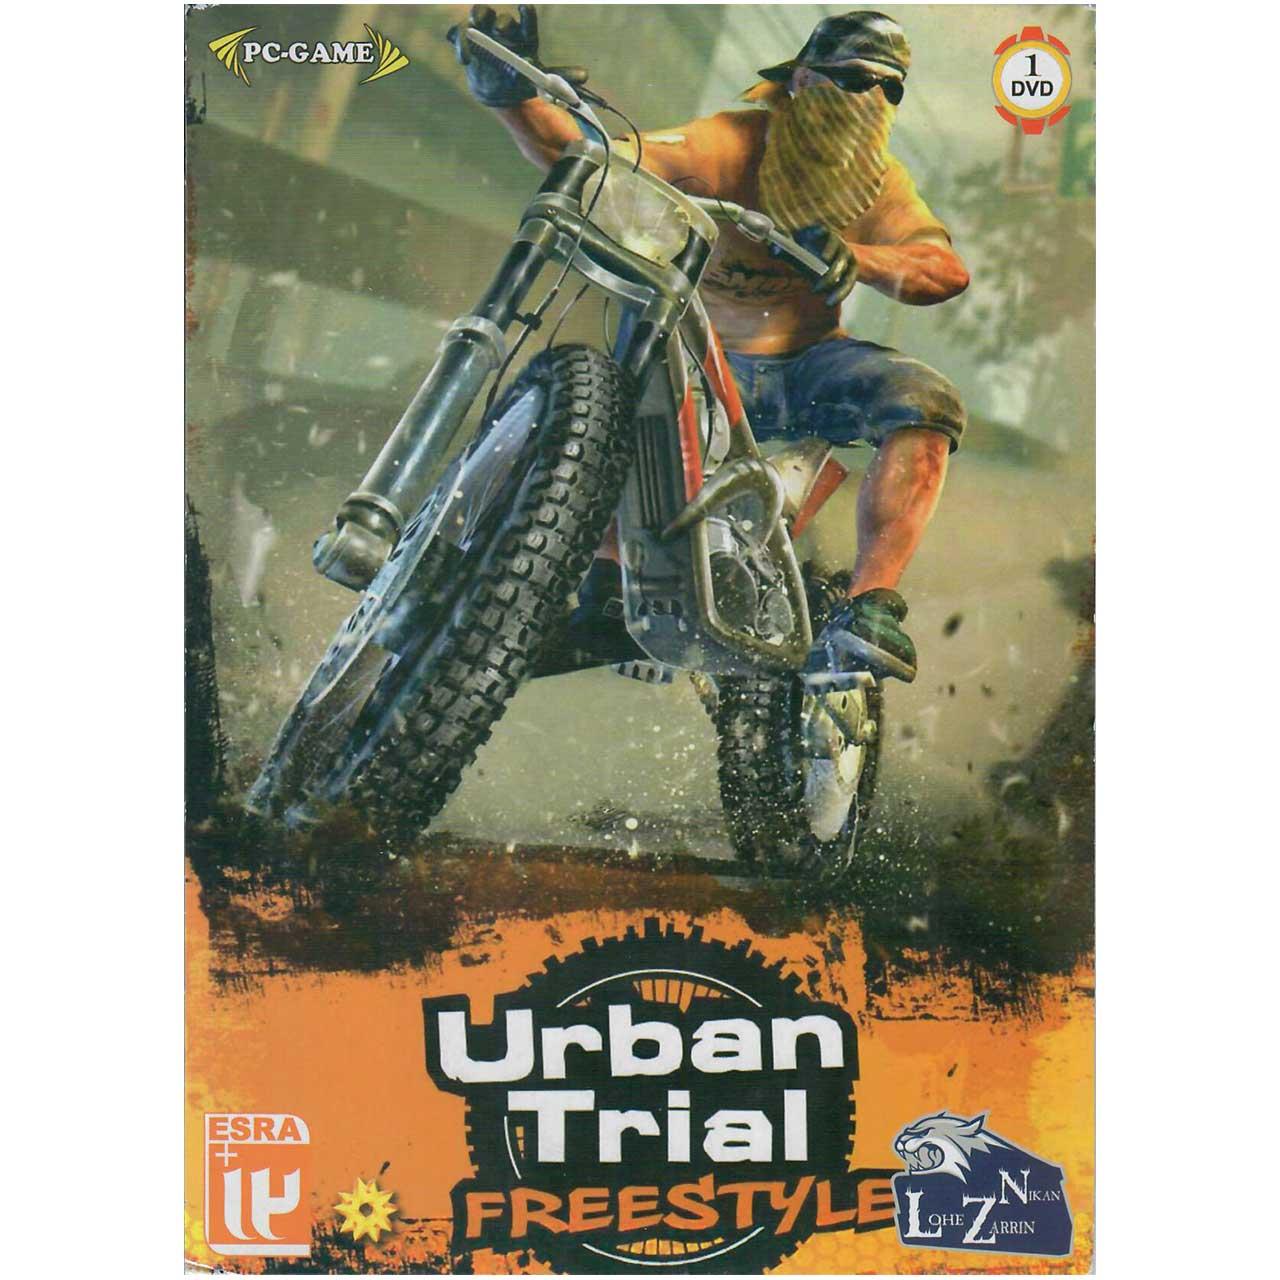 بازی کامپیوتری Urban Trial Freestyle مخصوص PC